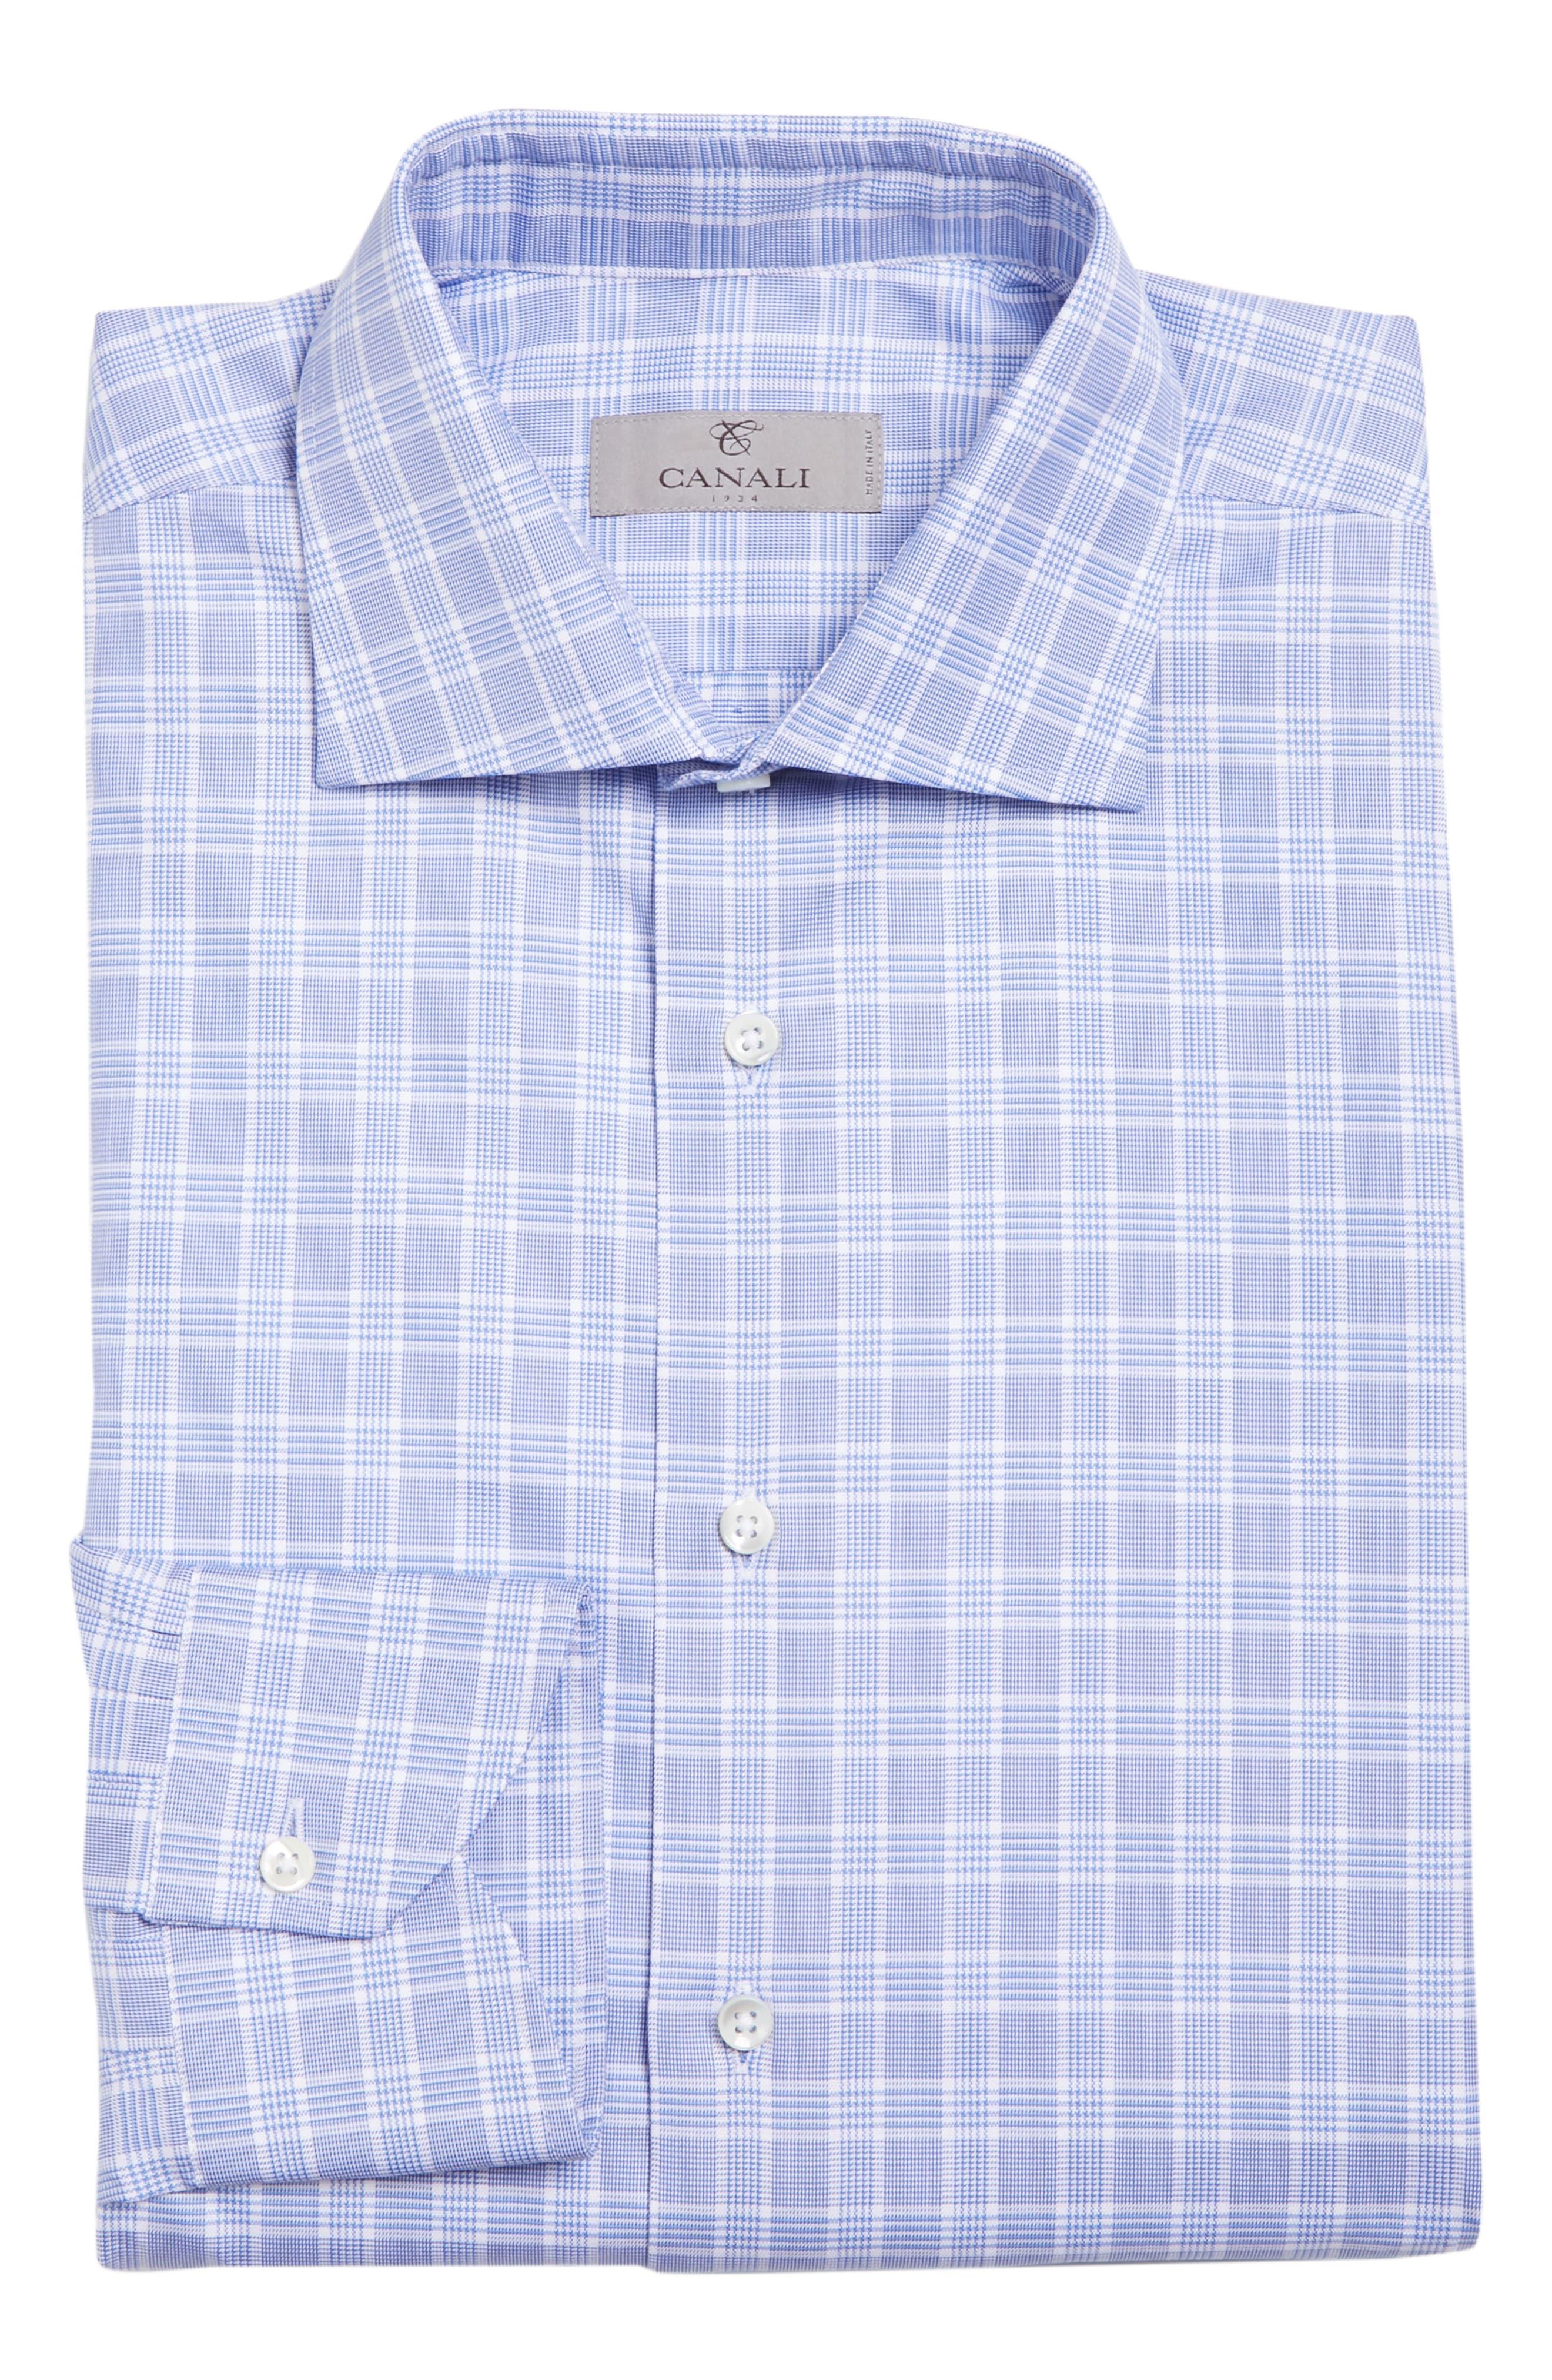 Regular Fit Check Dress Shirt,                             Alternate thumbnail 6, color,                             Brt Blue